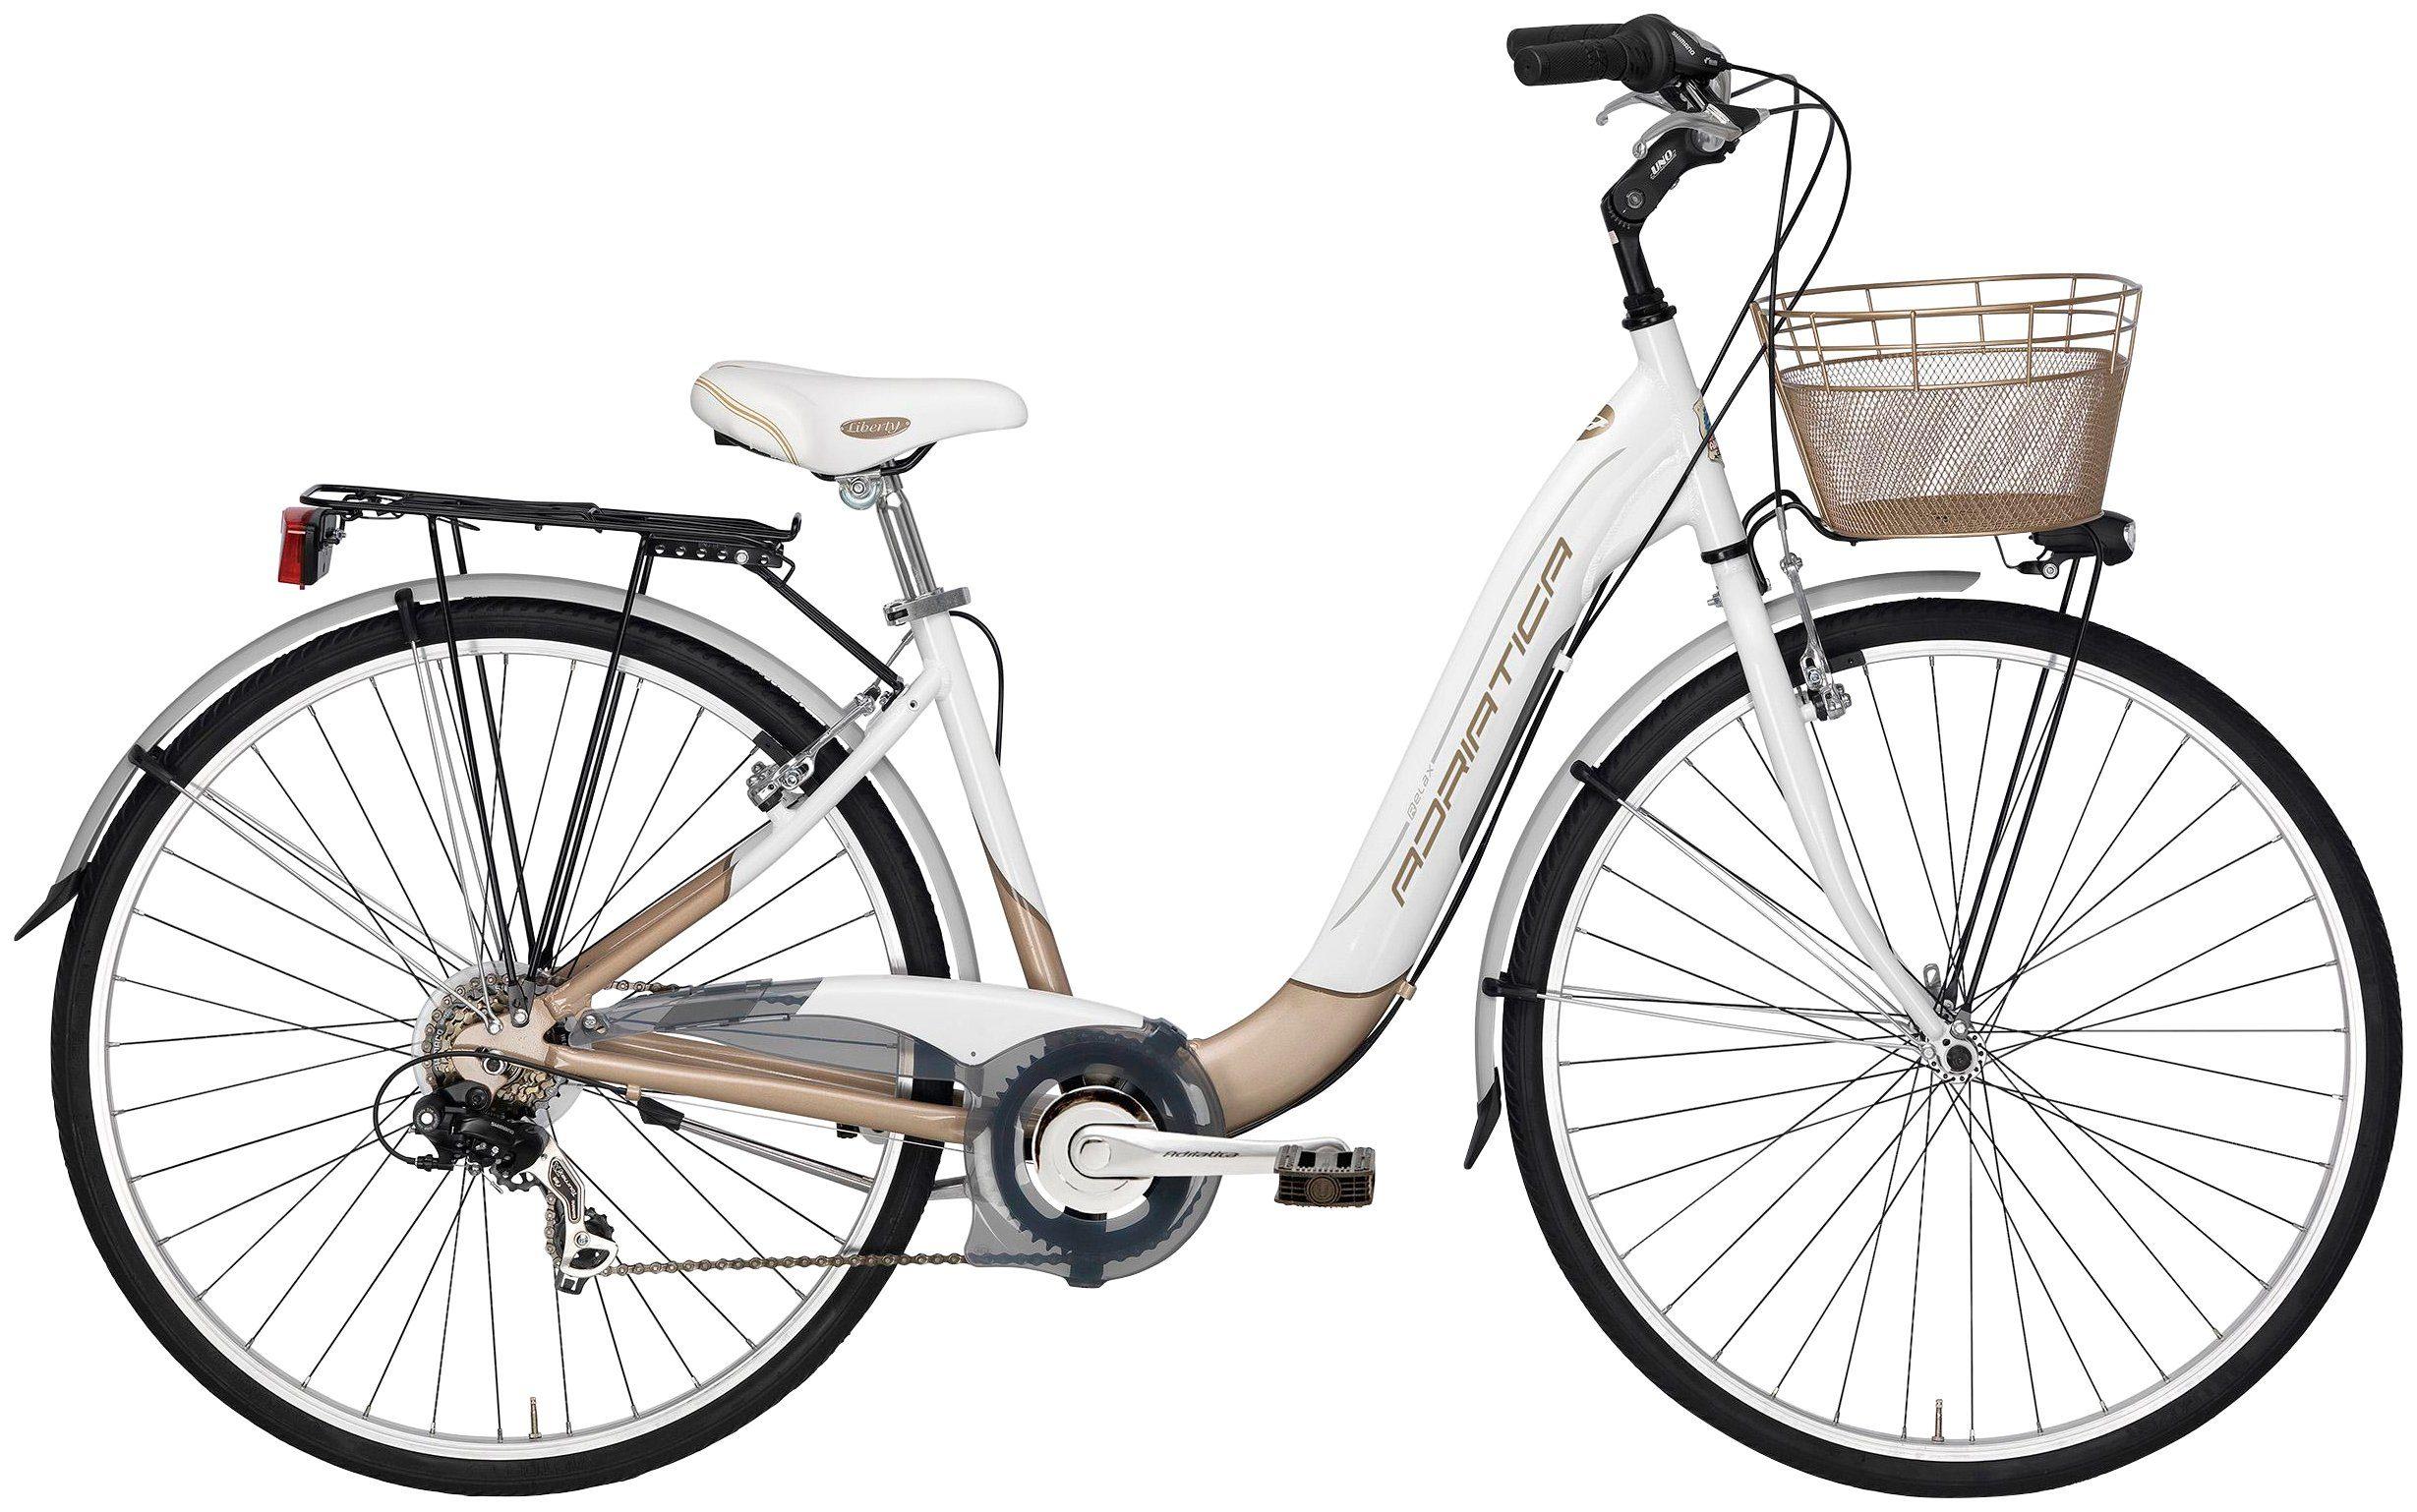 Citybike Damen »Relax«, 28 Zoll, 6 Gang, V-Bremsen